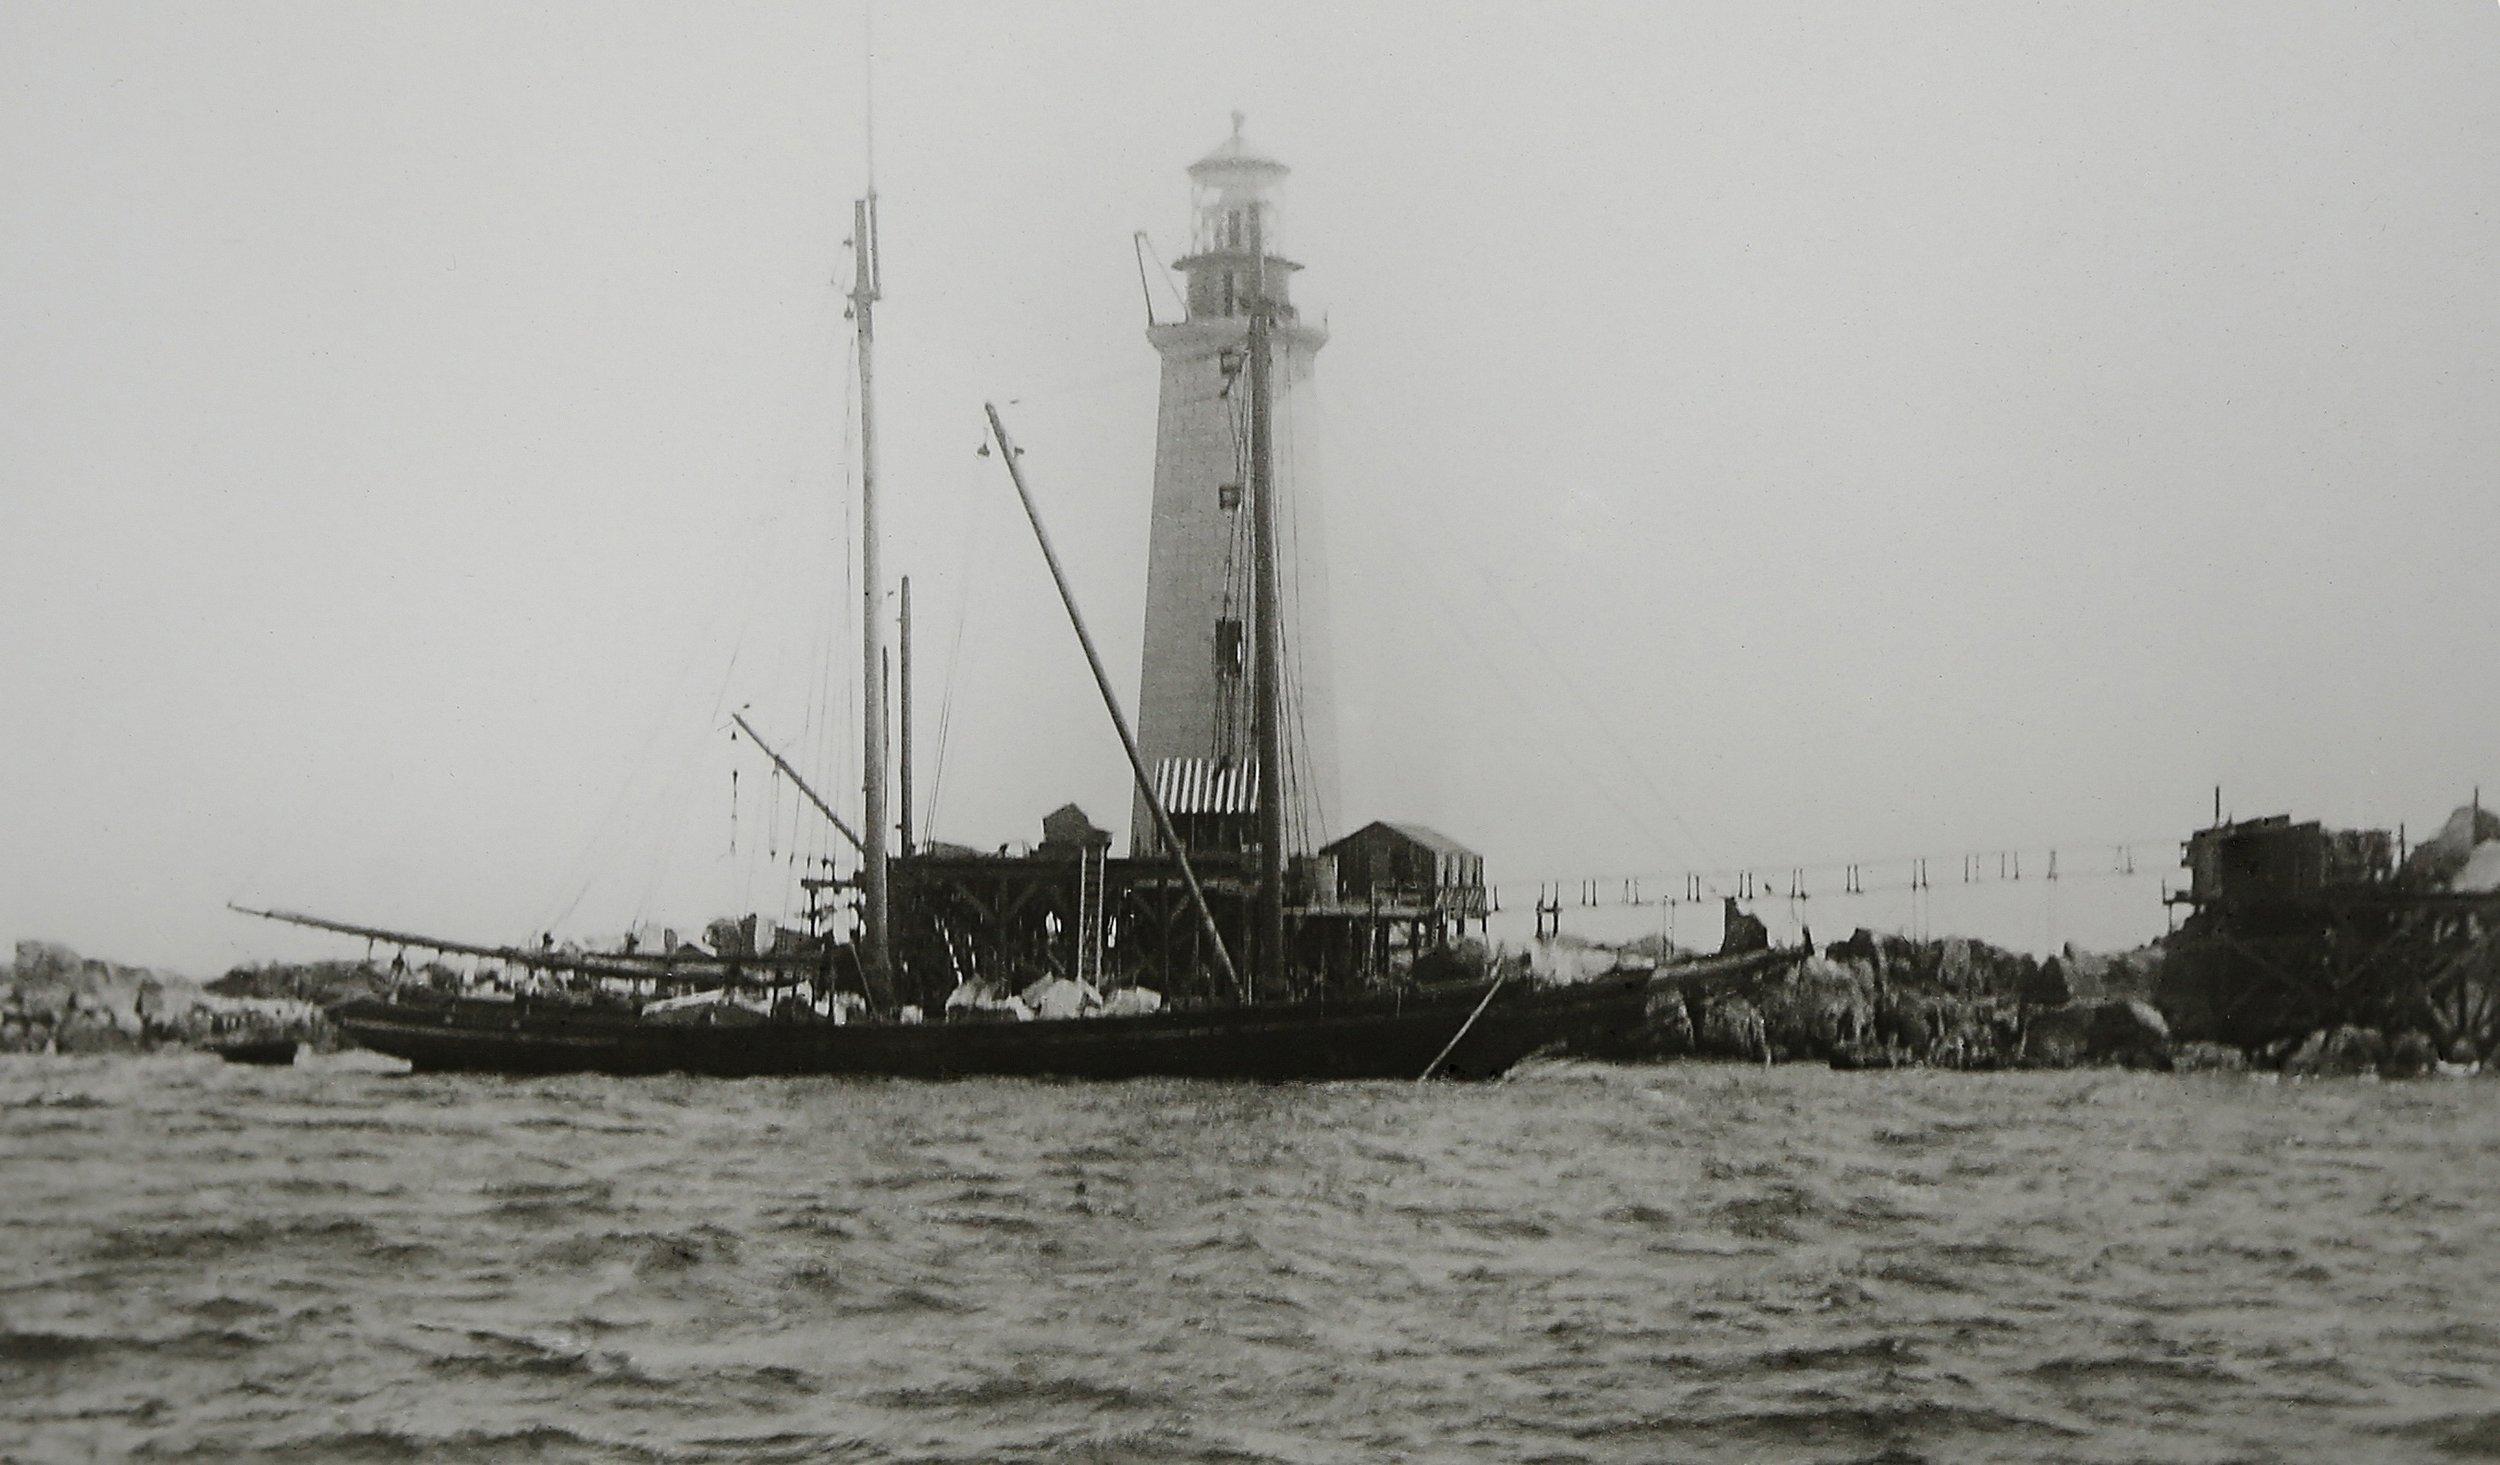 110-ton-Stone-Schooner-delivering-riprap-1905-copy.jpg